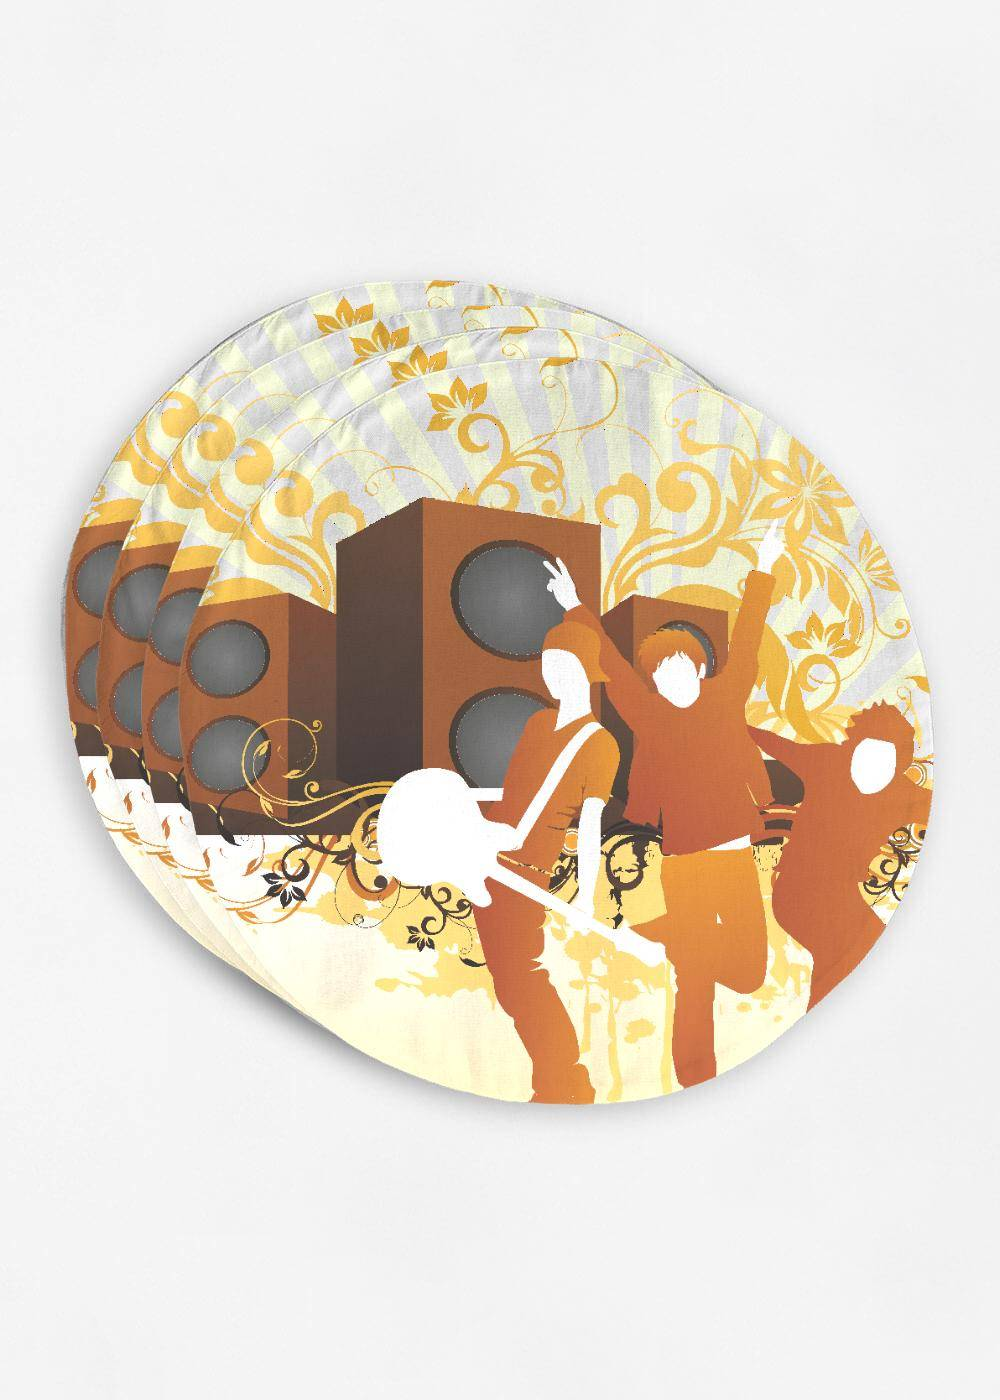 VIDA Placemat Set - Music Background by VIDA Original Artist  - Size: Set of 4